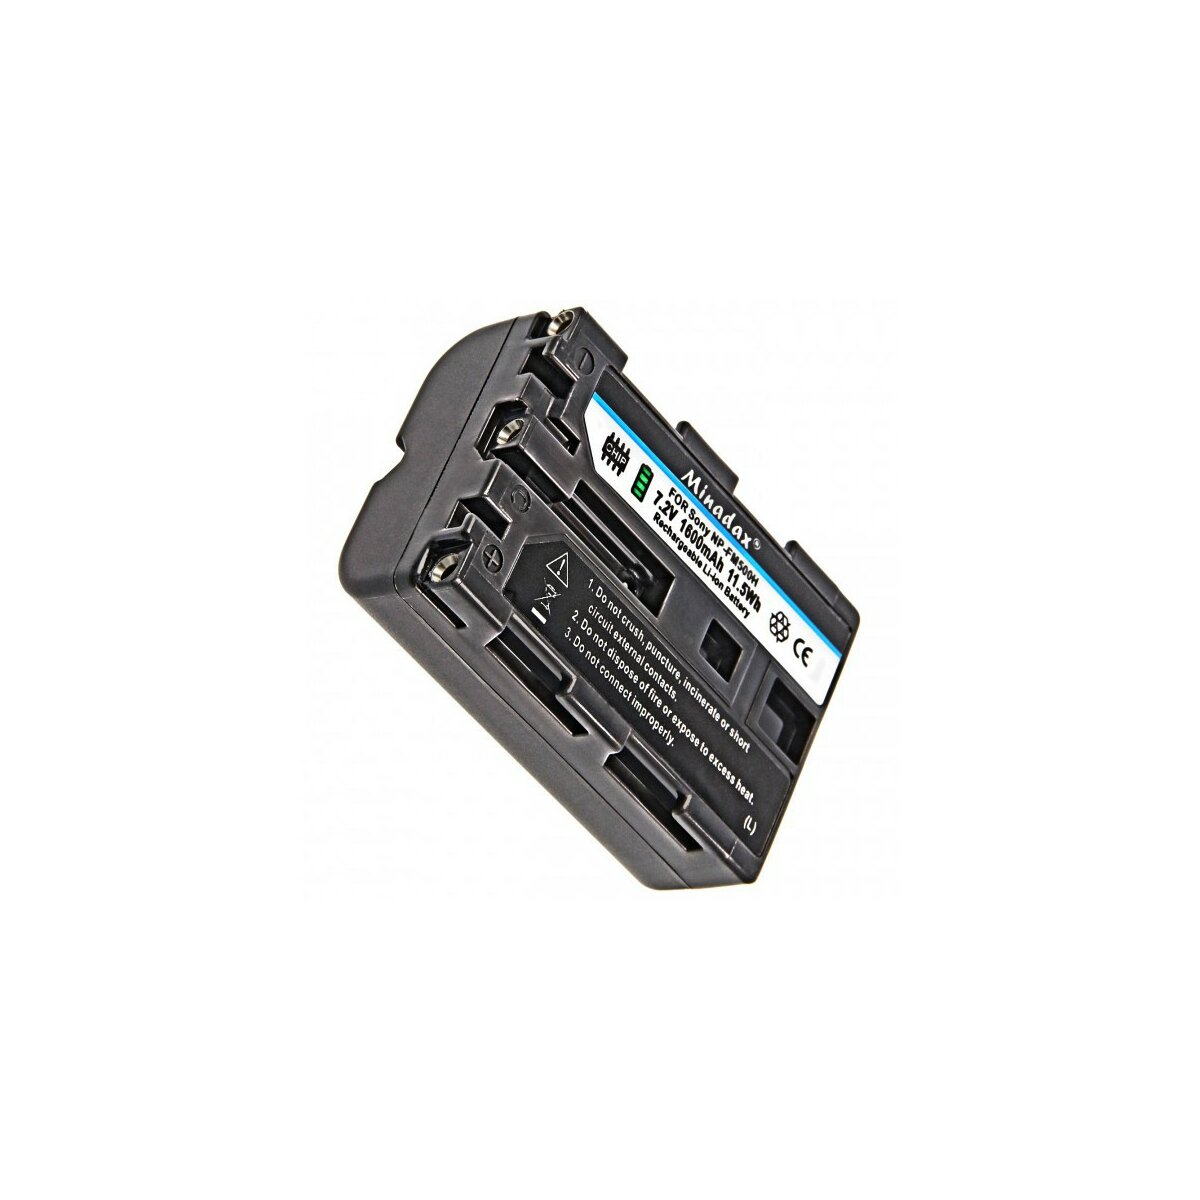 "Minadax PRO Li-Ion Akku ""Hohe Kapazitaet"" 1600 mAh kompatibel für Sony - Ersatz für NP-FM500H"